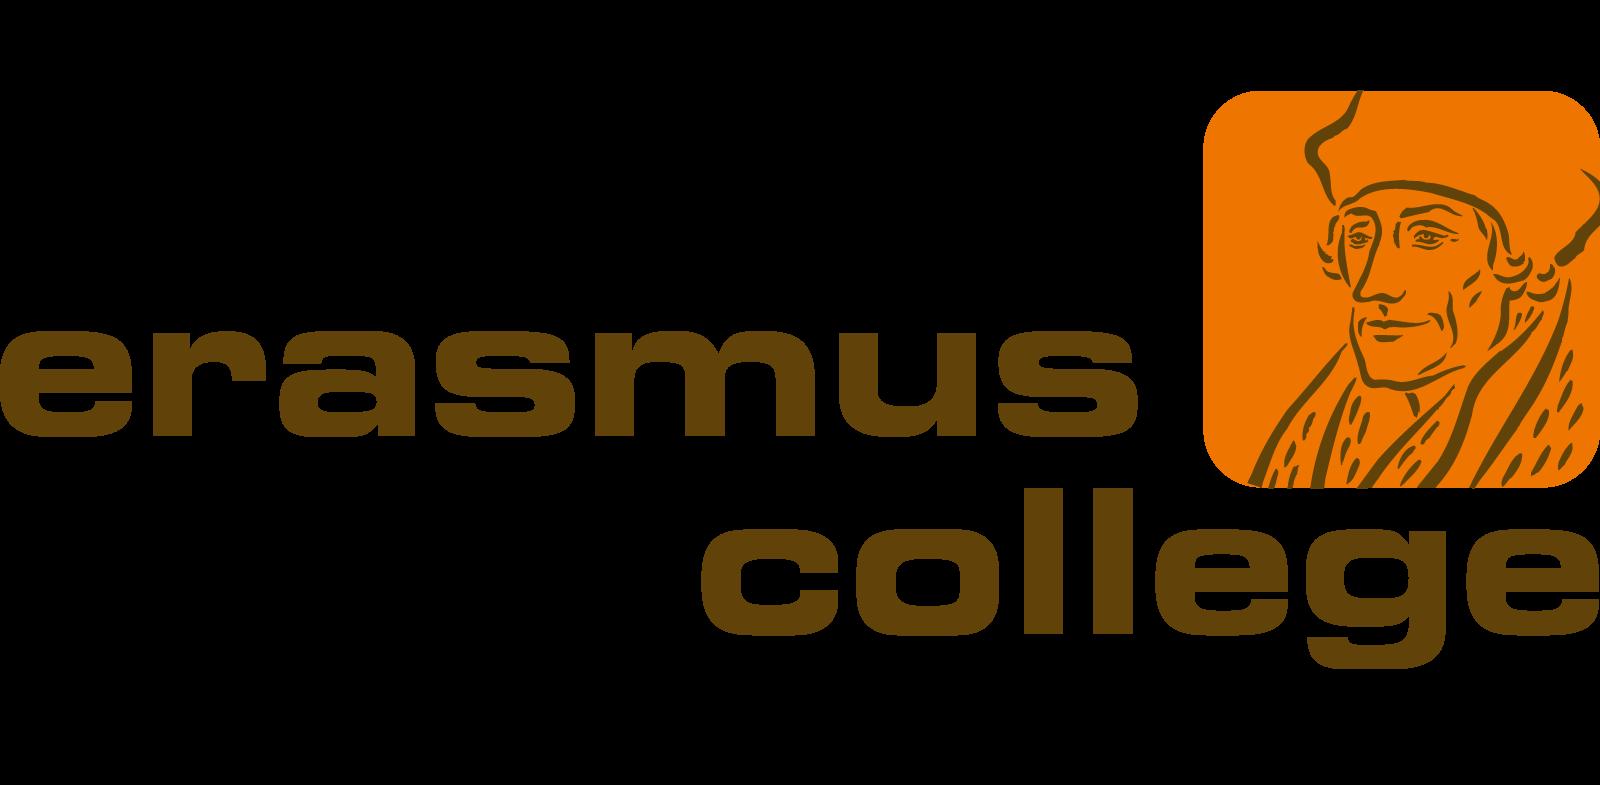 Erasmus College Dalton Zoetermeer logo